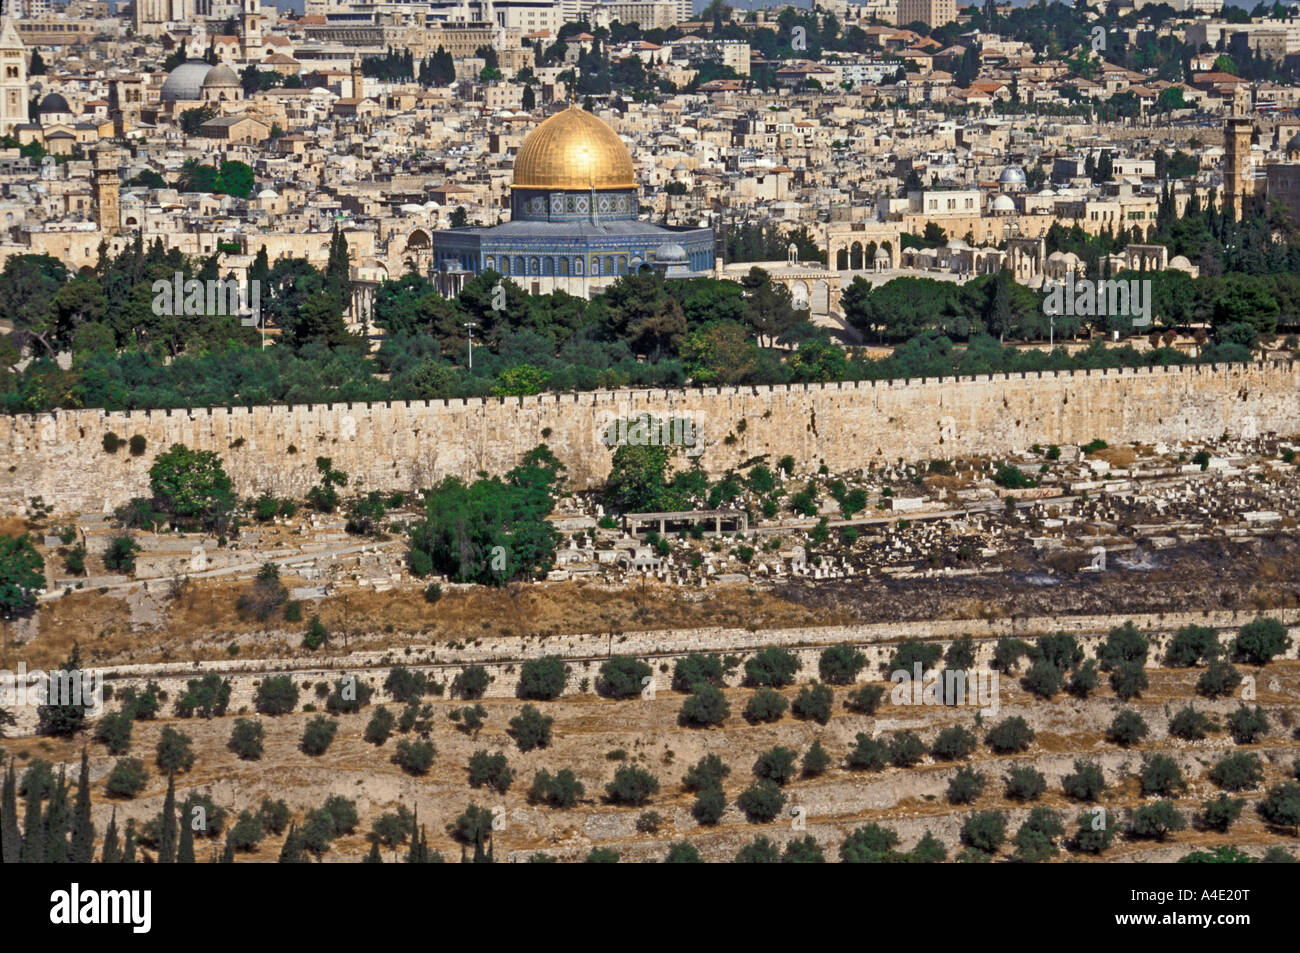 Jerusalem Old City And Dome Of The Rock From Garden Of Gethsemane,  Jerusalem, Israel